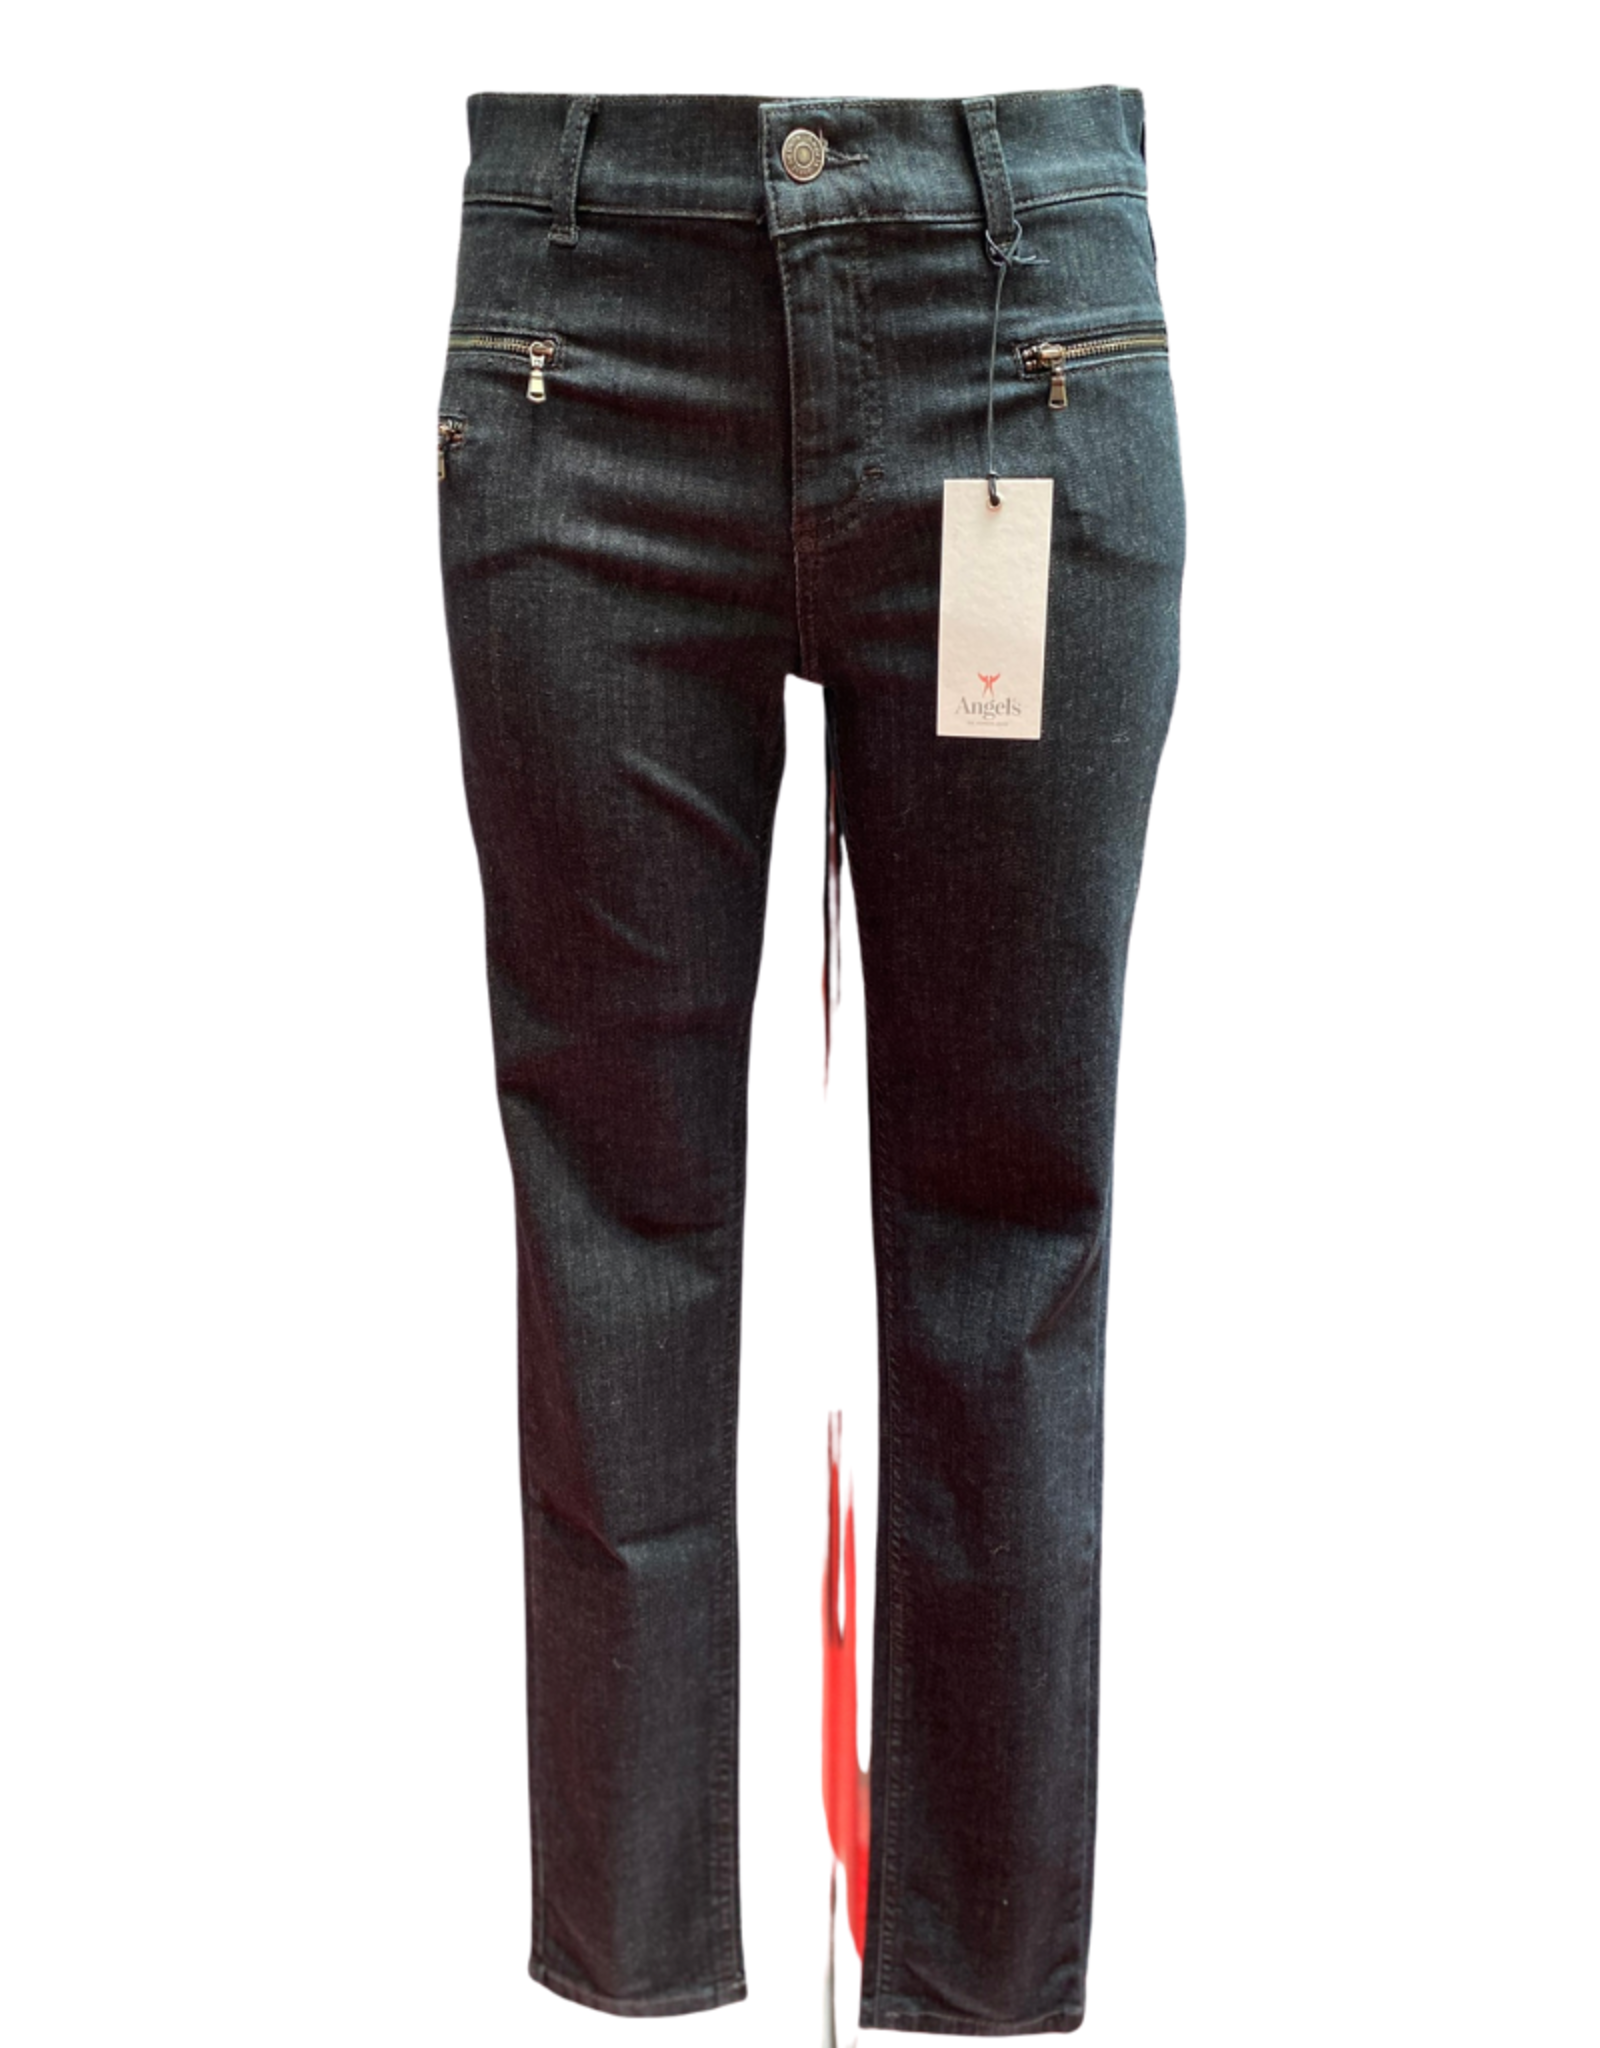 Angels jeans 770030-346/301 Malu zip